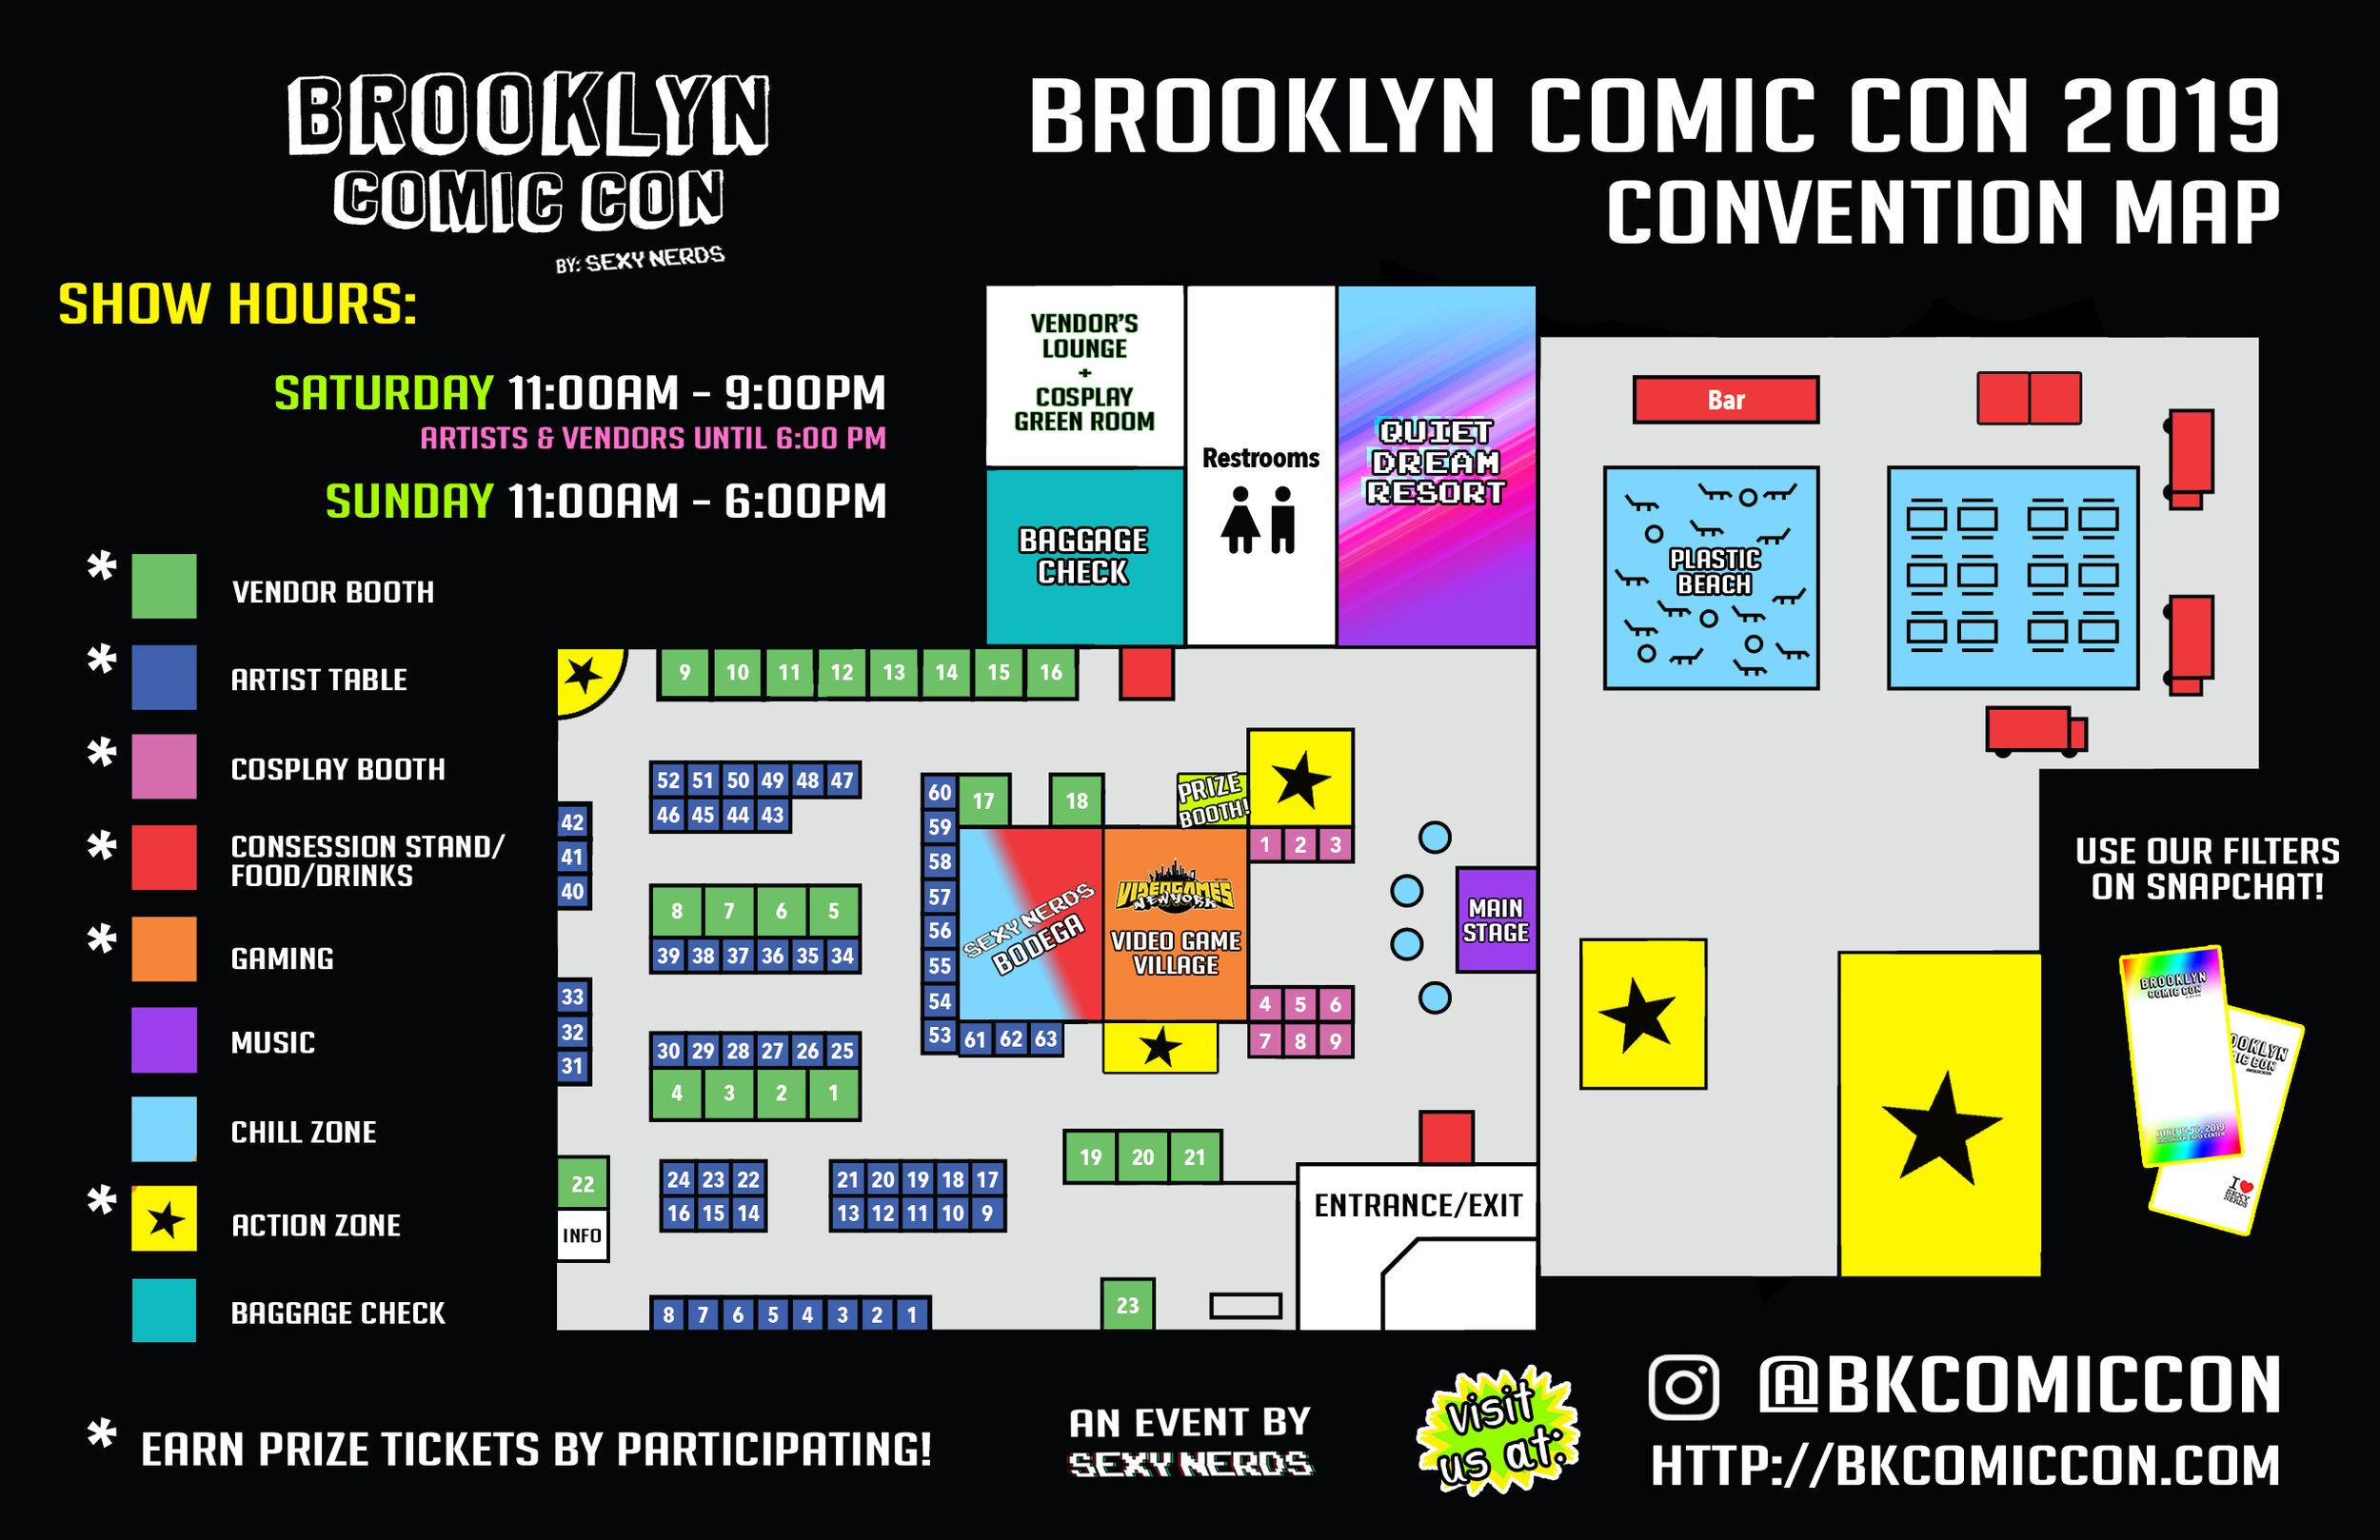 bkcomiccon final floorplan 4.jpg